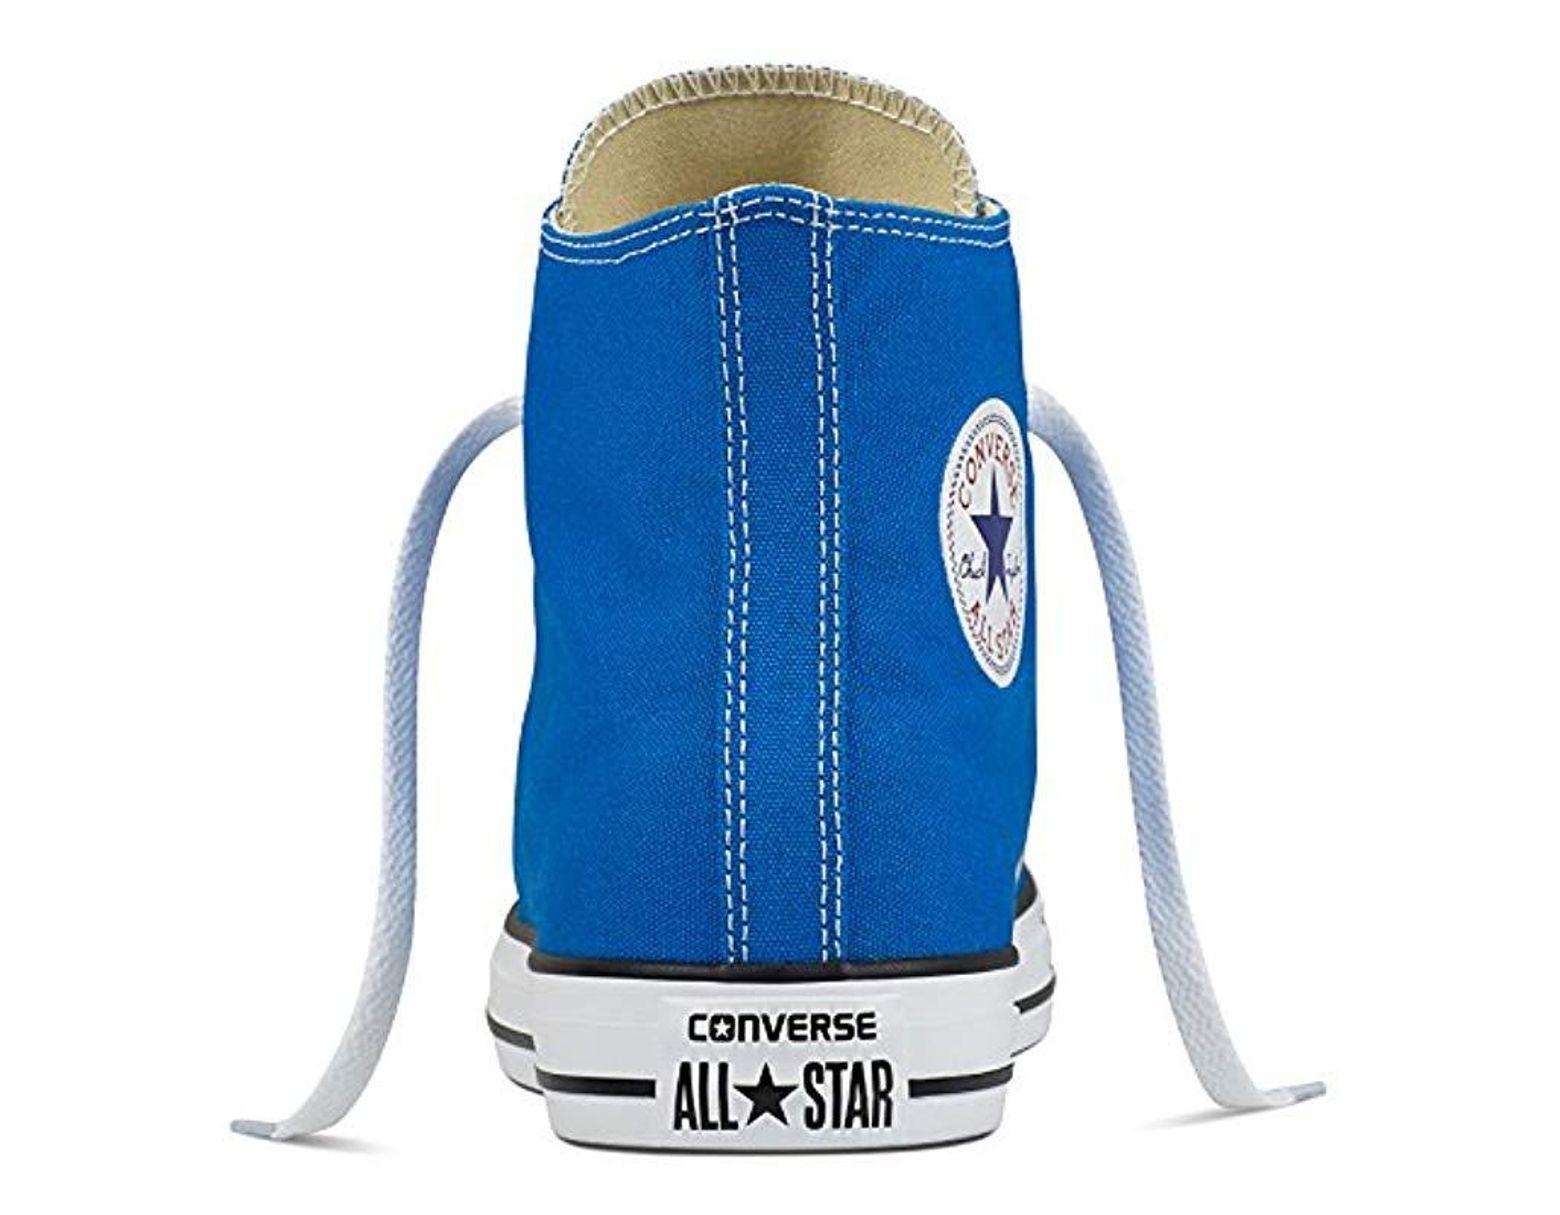 Sneakers Ctas En Lyst HiHaute Bleu Converse Pour Homme Coloris Iv6gYf7yb